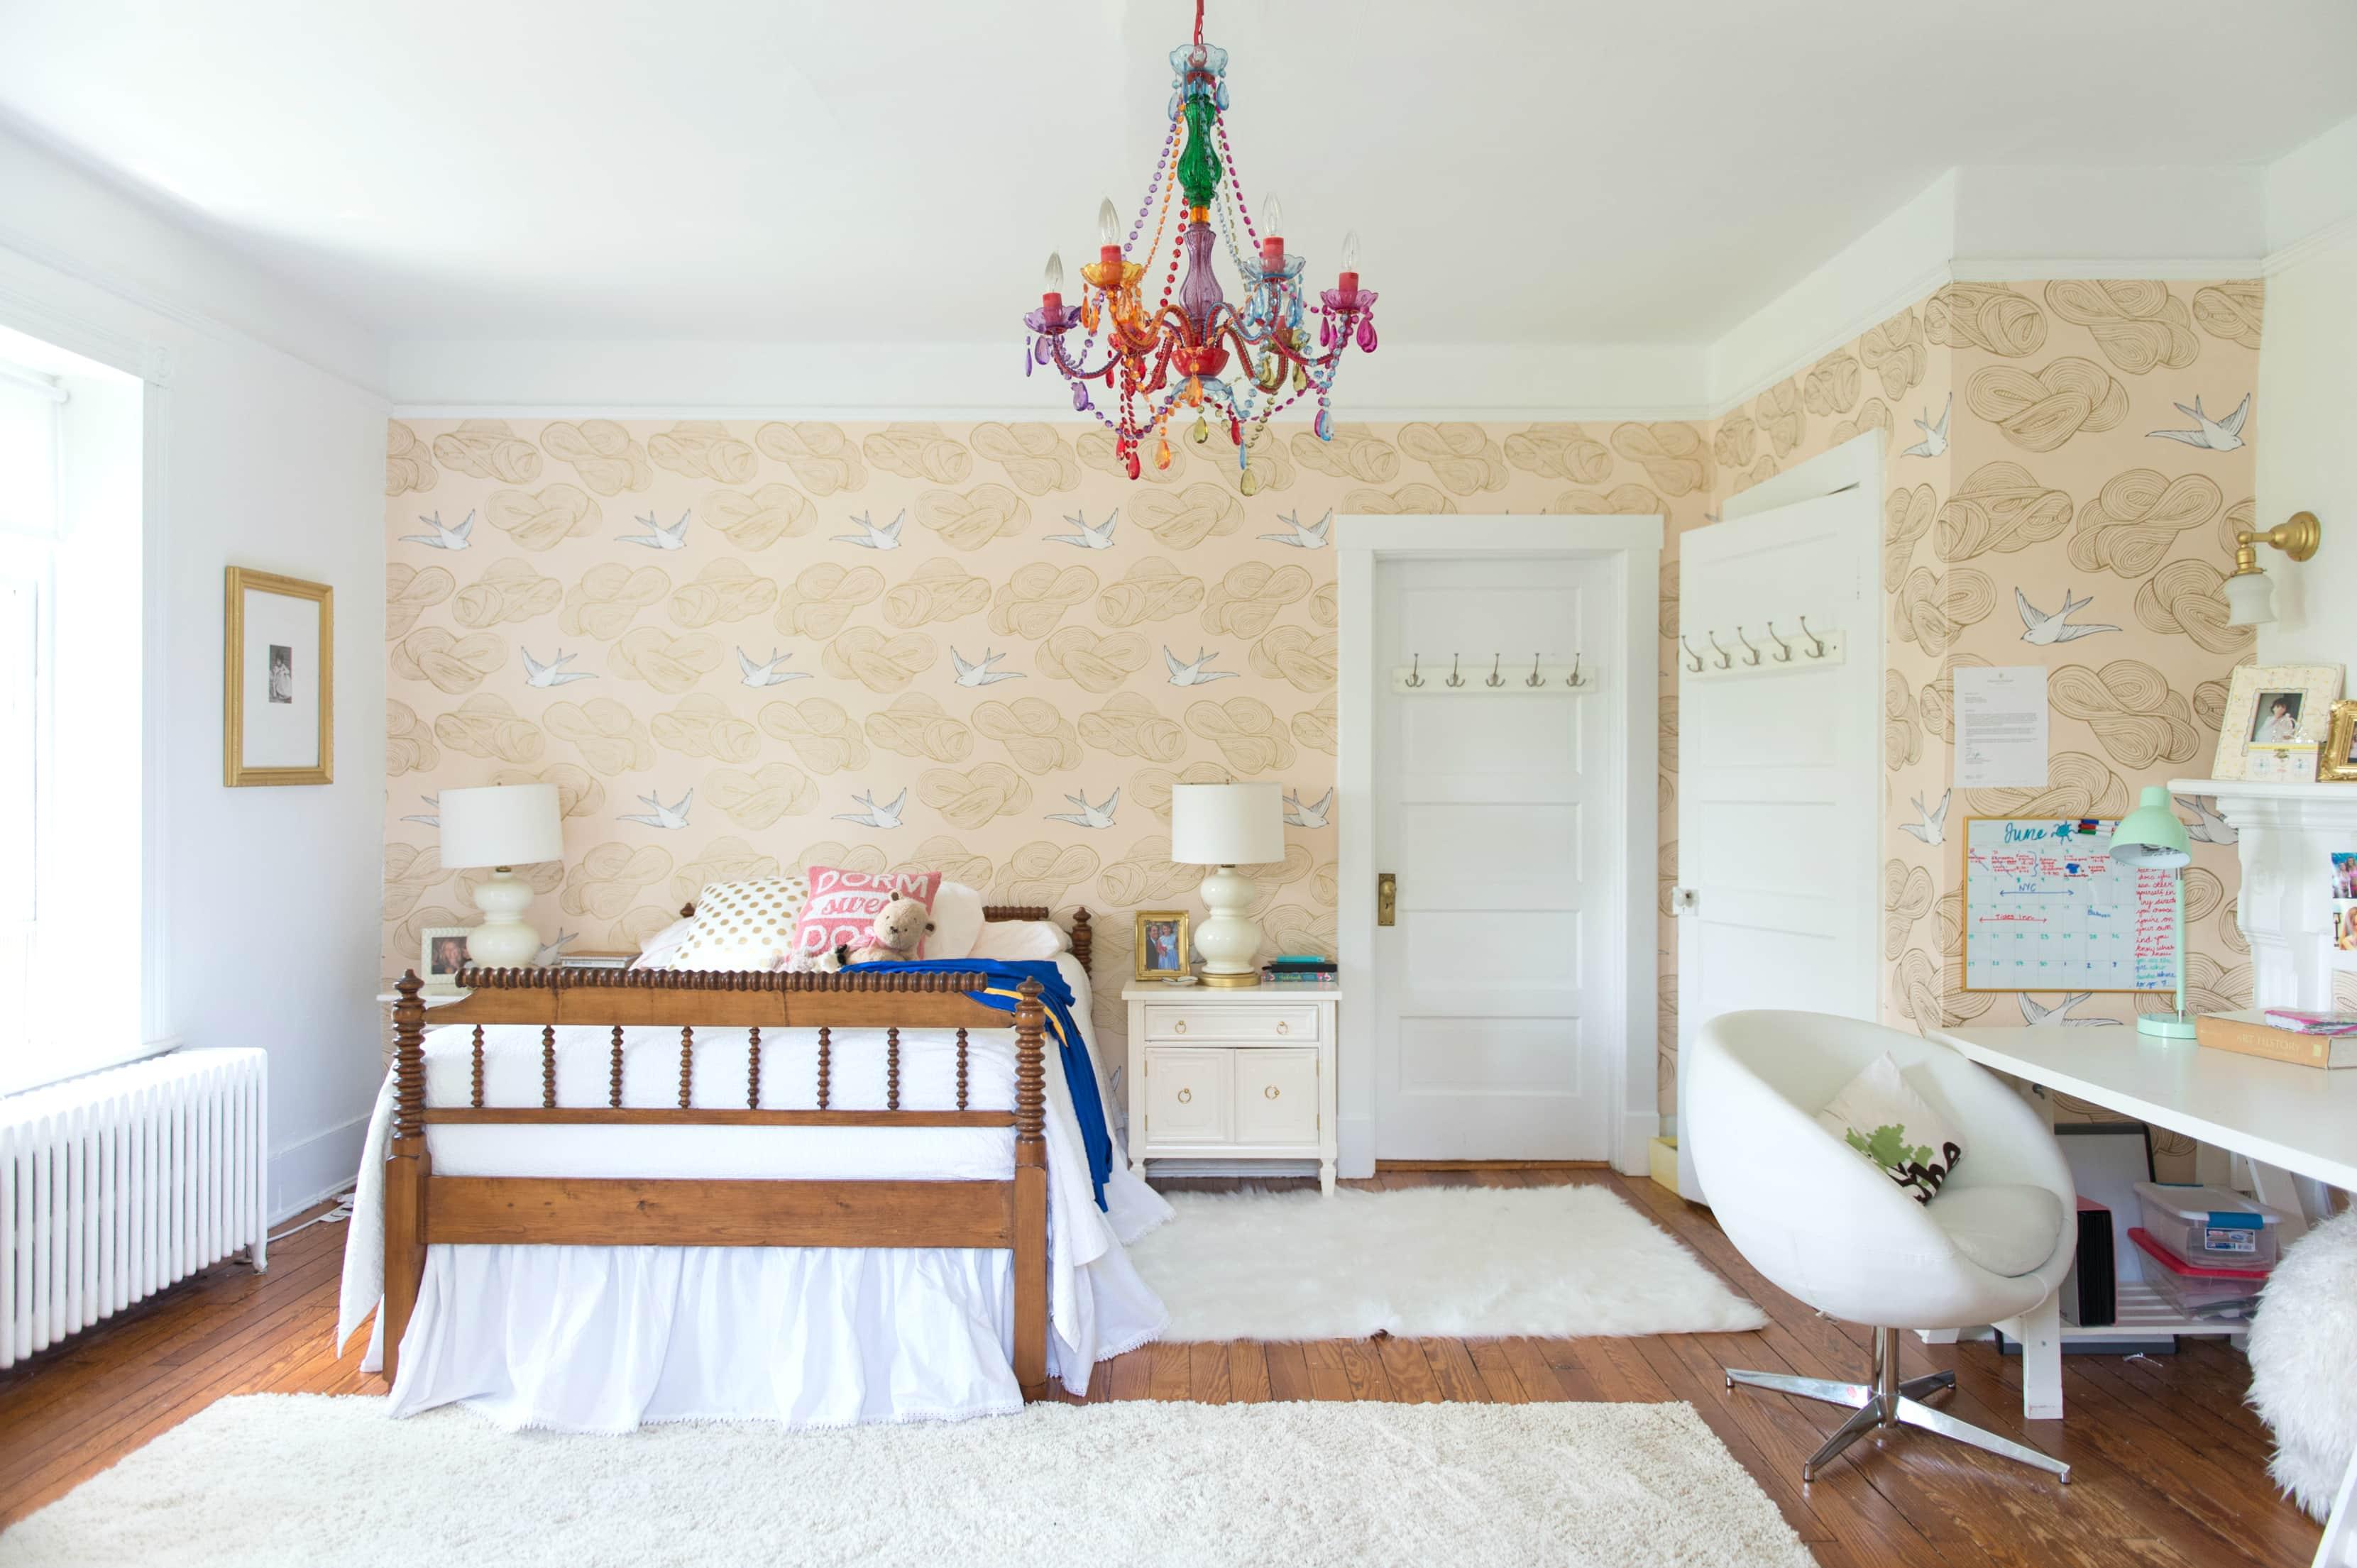 Captivating Little Kids, Big Style: Our Favorite Kids Rooms U0026#038; Nurseries Of